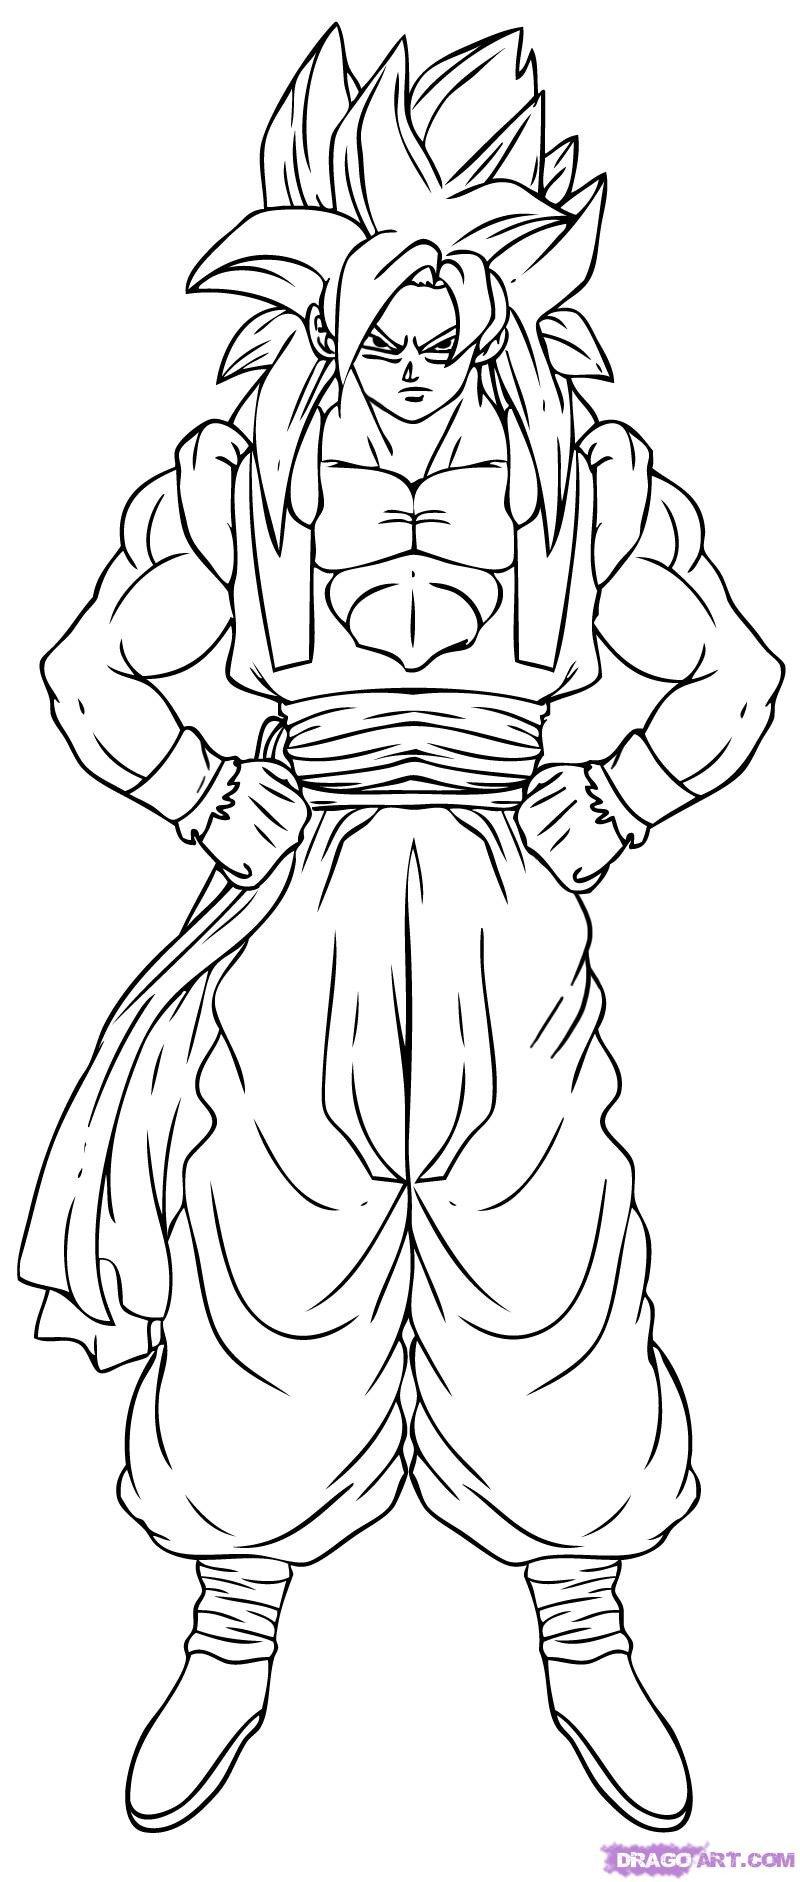 desenhos para colorir do dragon ball z free coloring pages